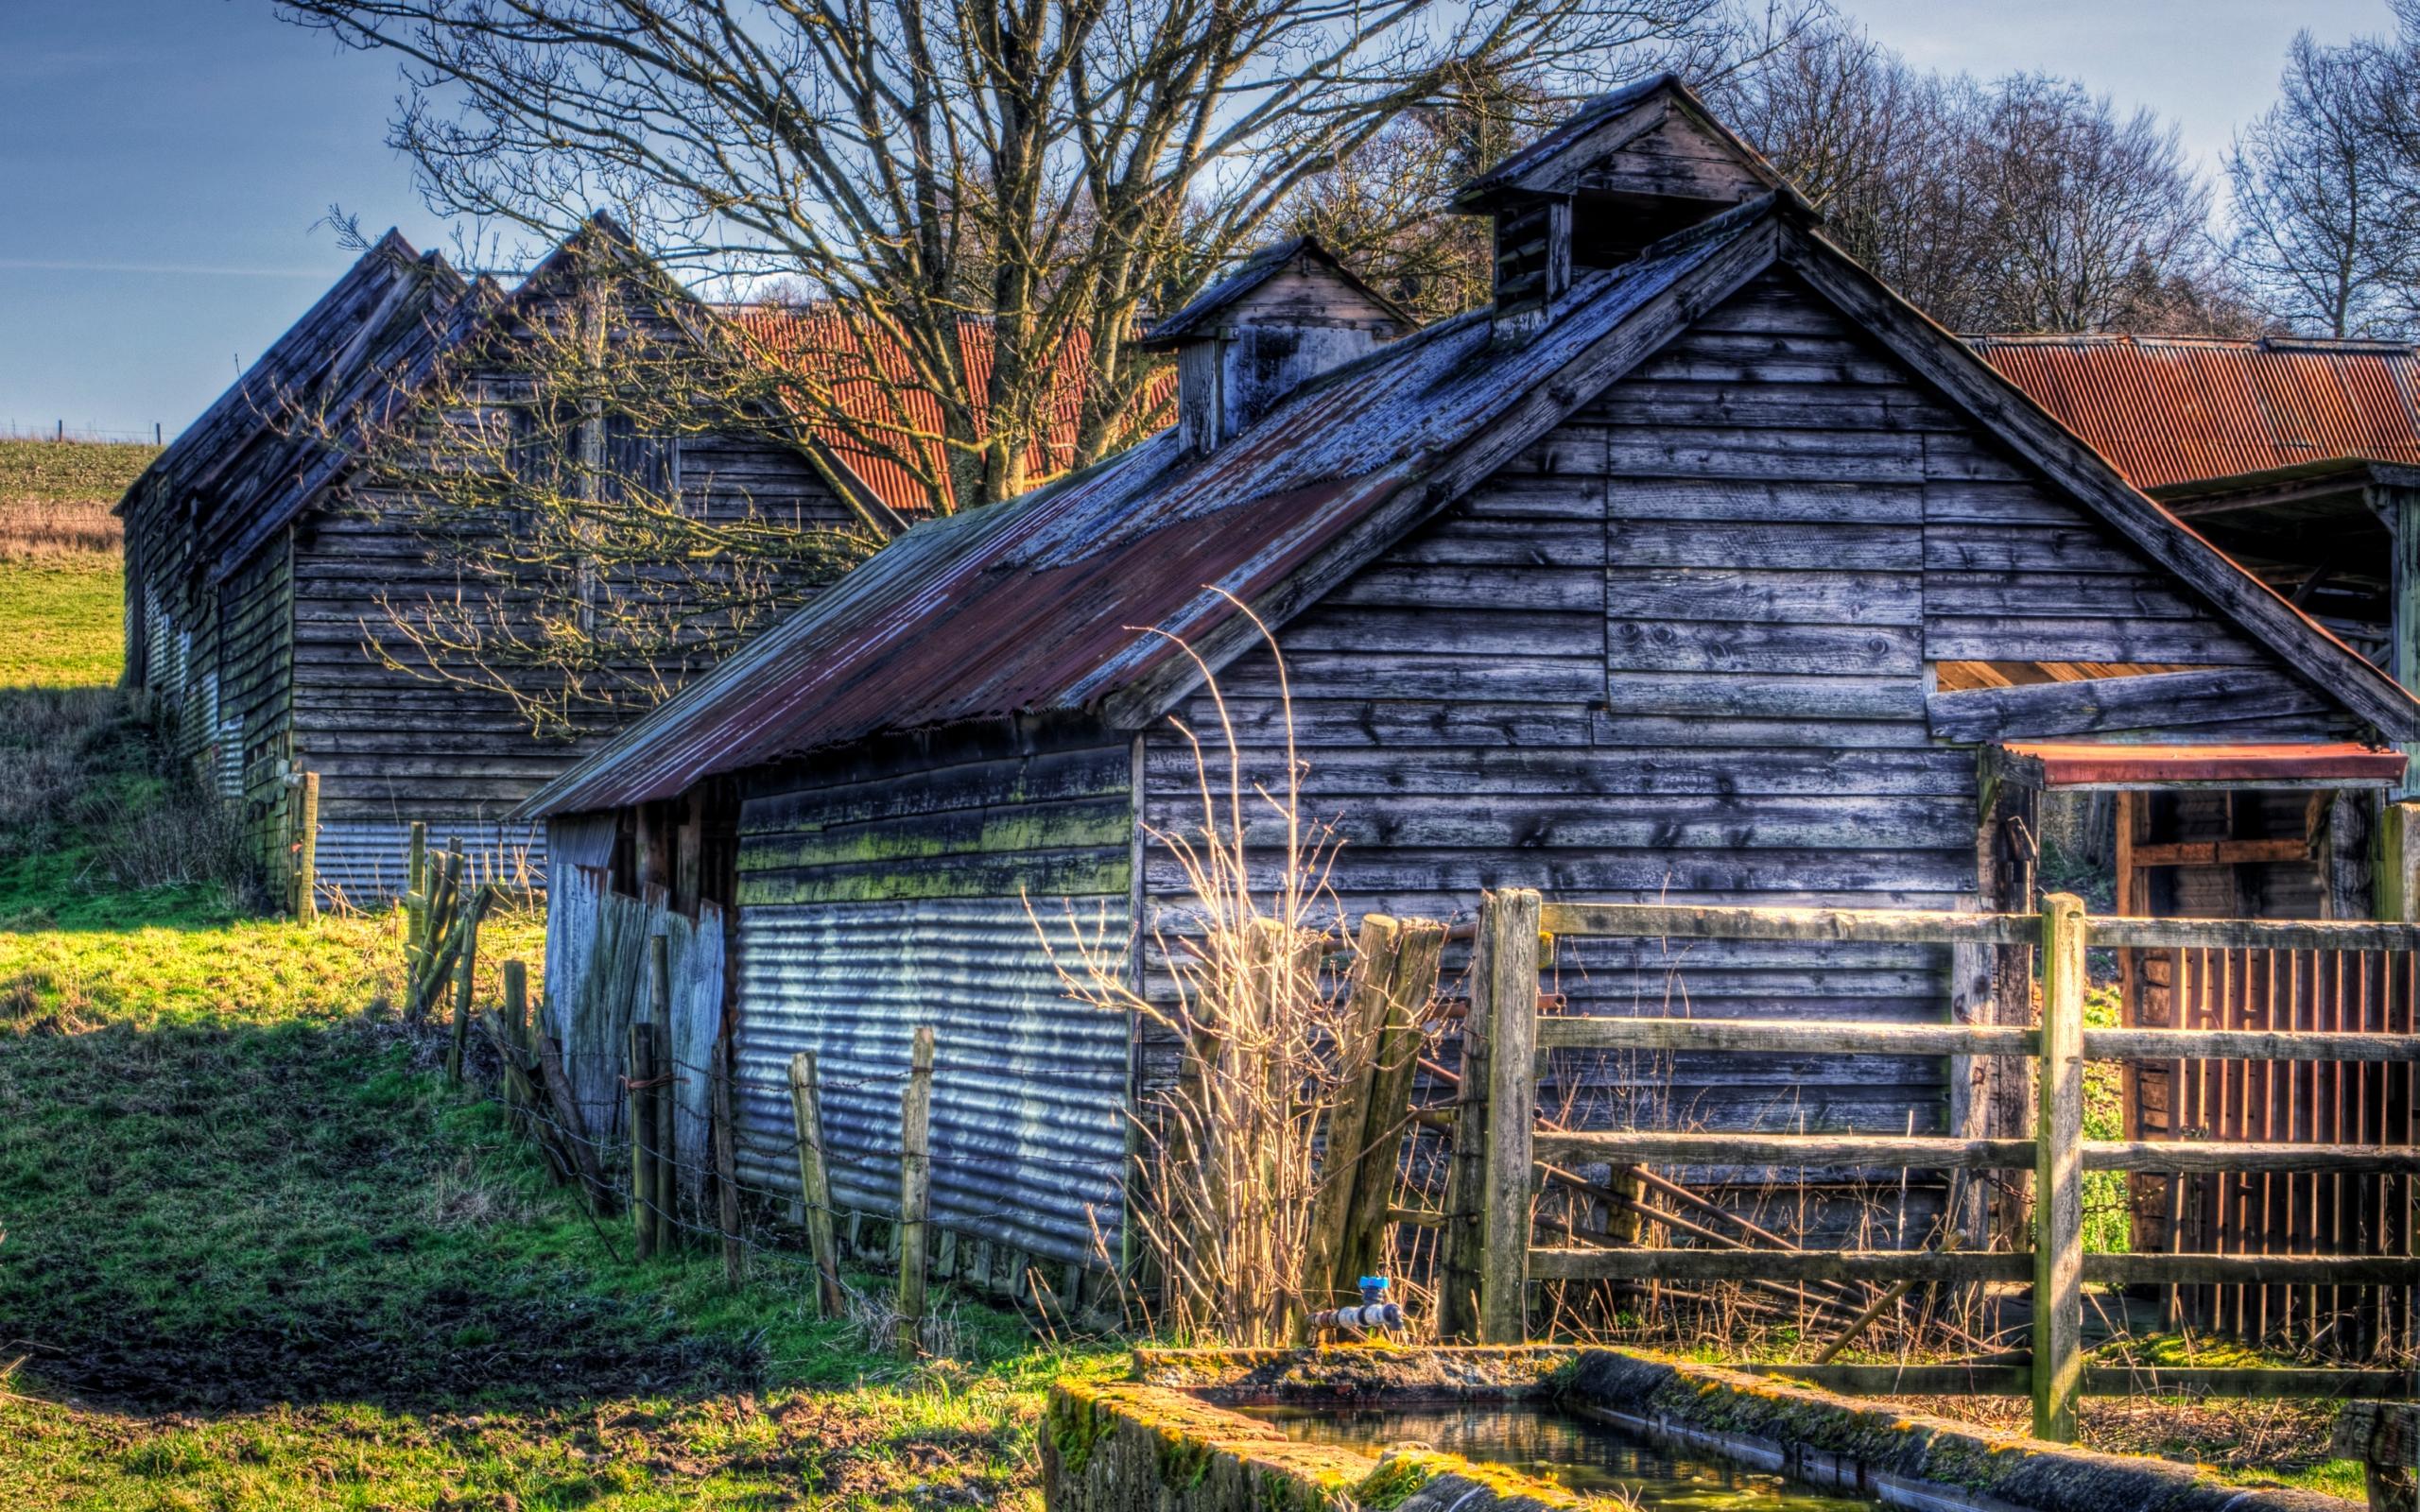 barn wallpaper - photo #34